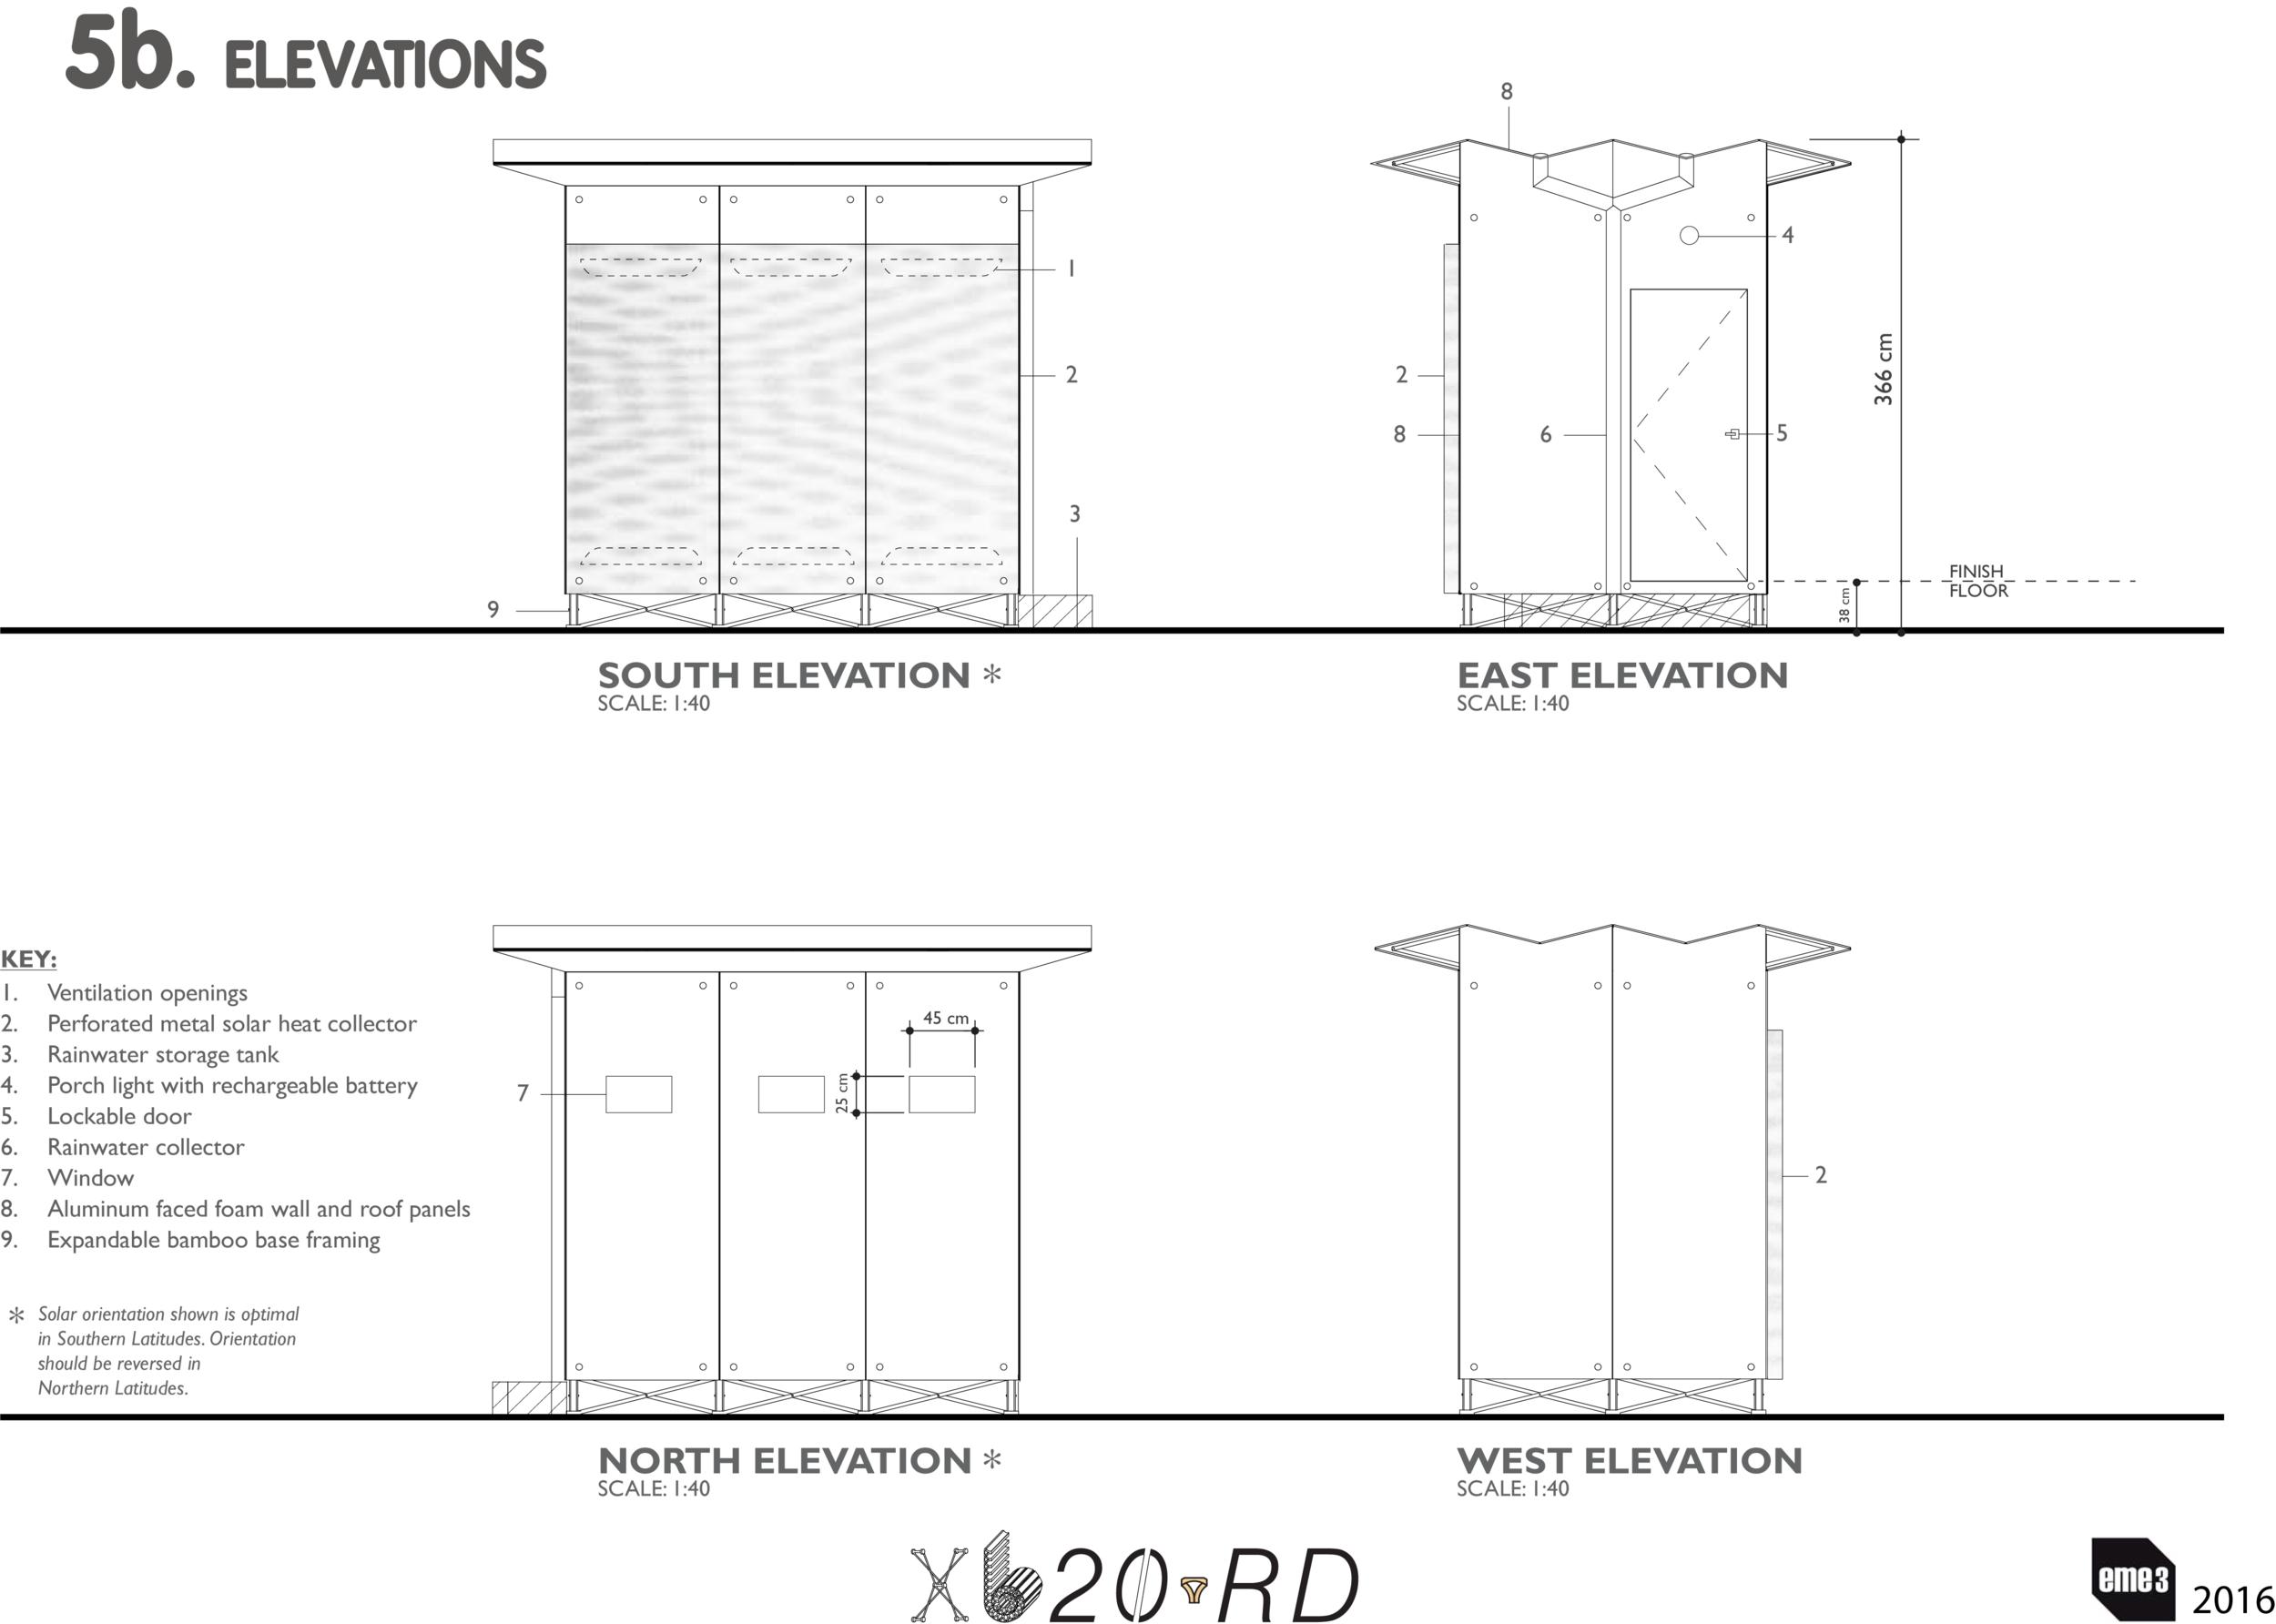 05-B ELEVATIONS.png